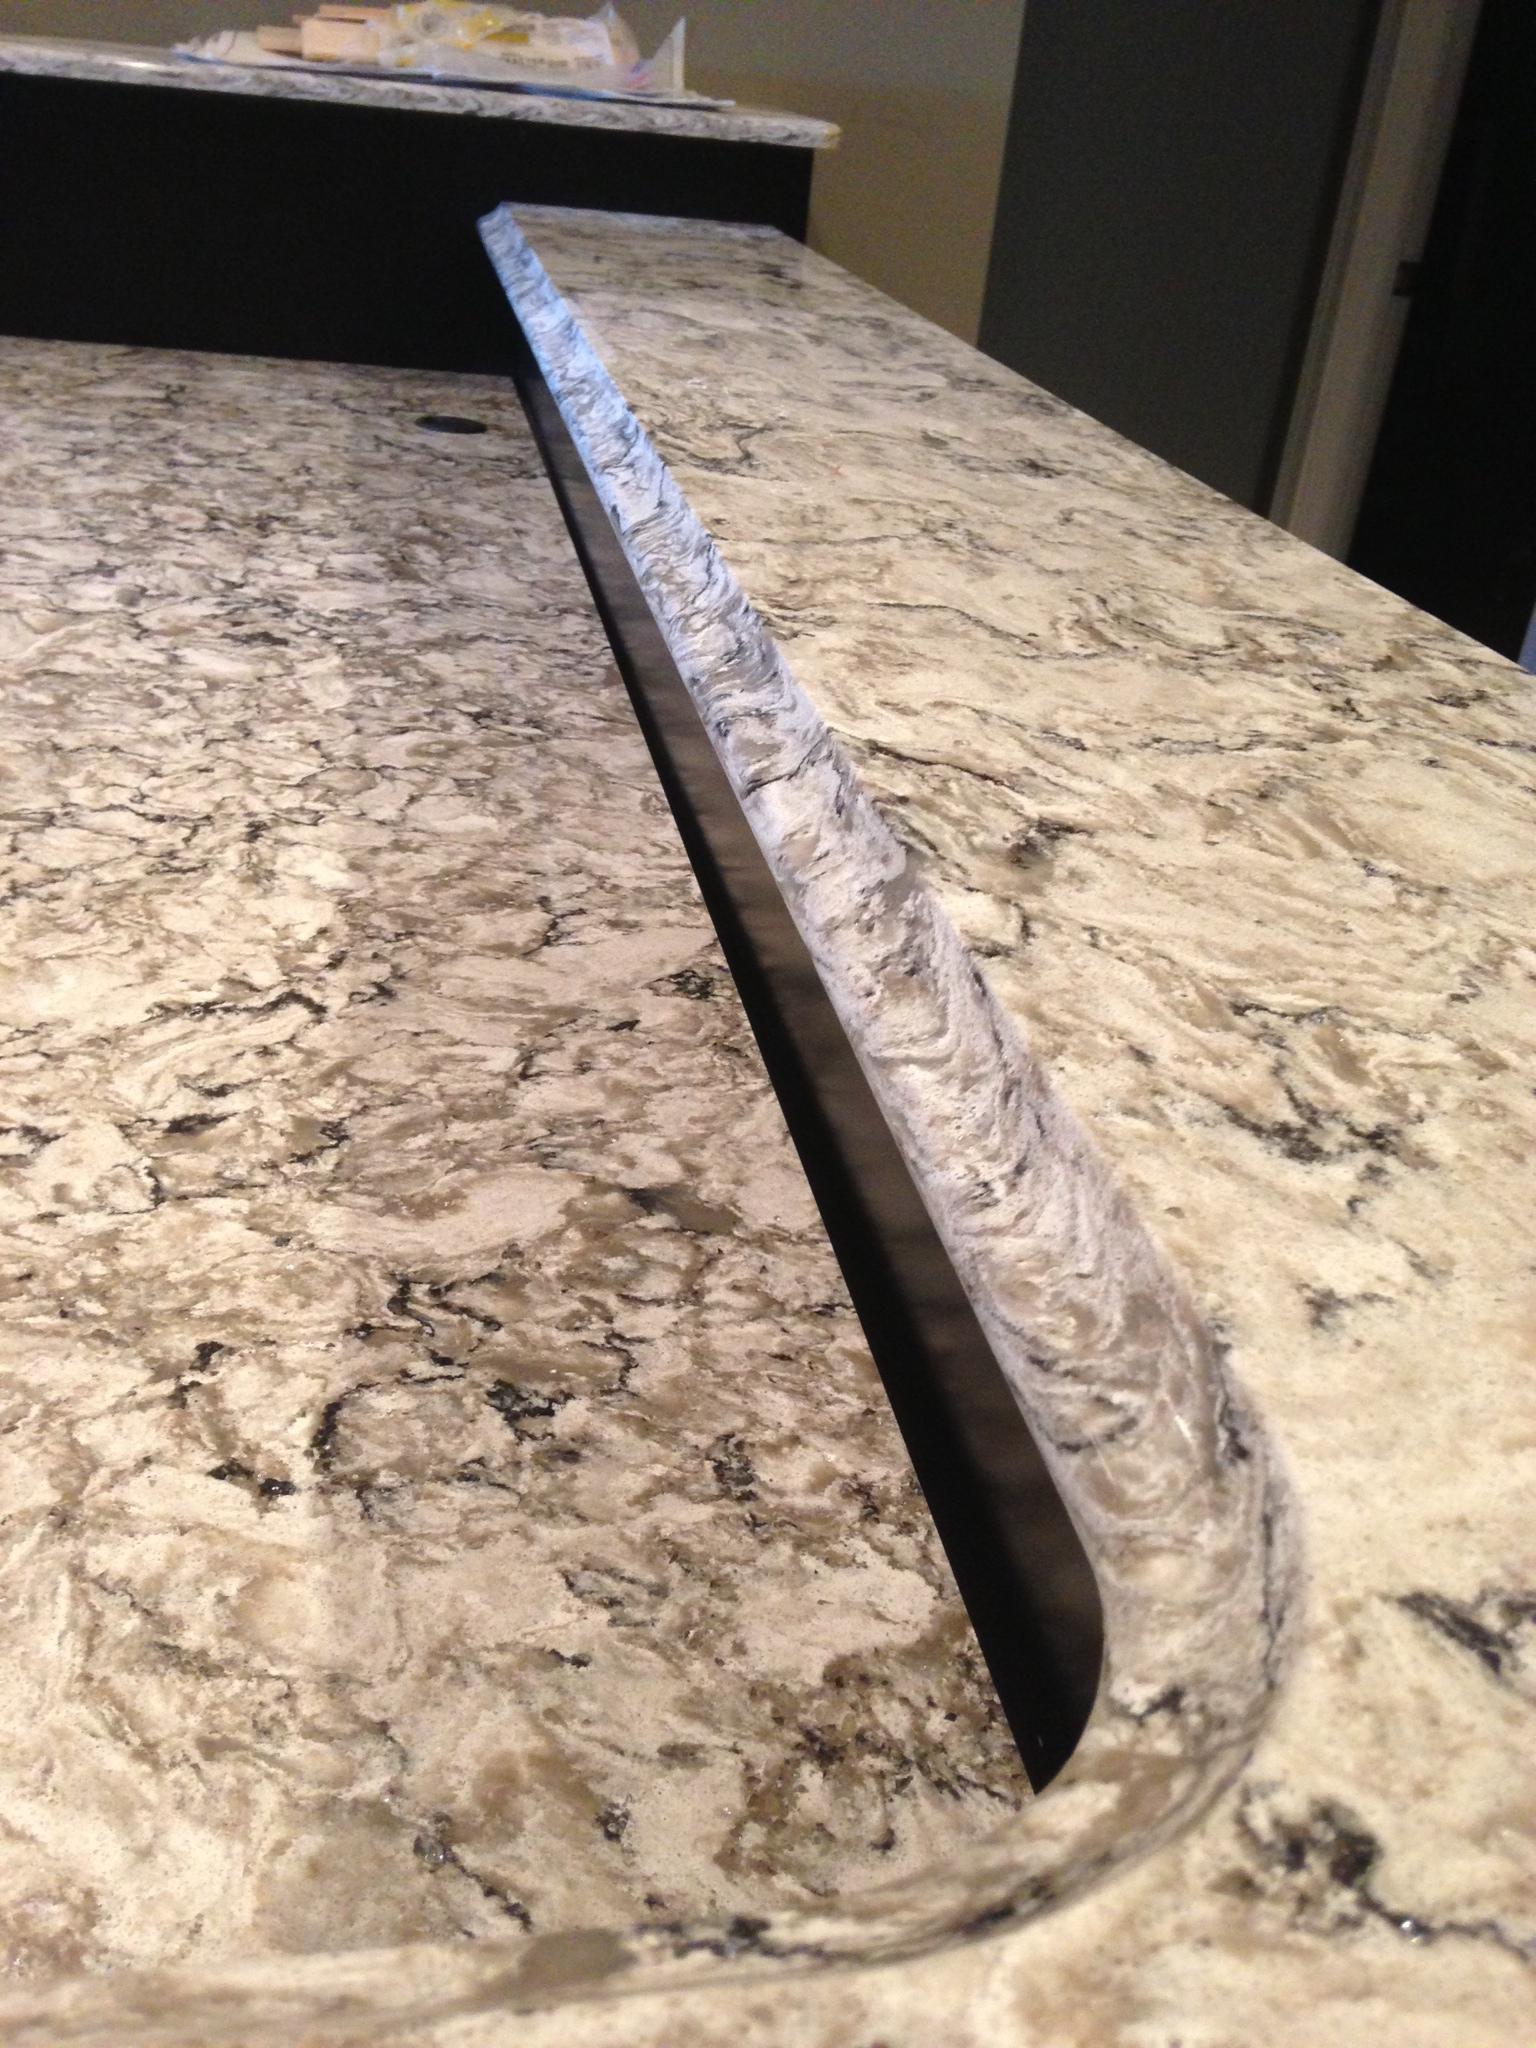 Discount Granite Countertops Syracuse Ny : Black Cambria Granite Countertop Black Cambria Is A Solid Black Stone ...